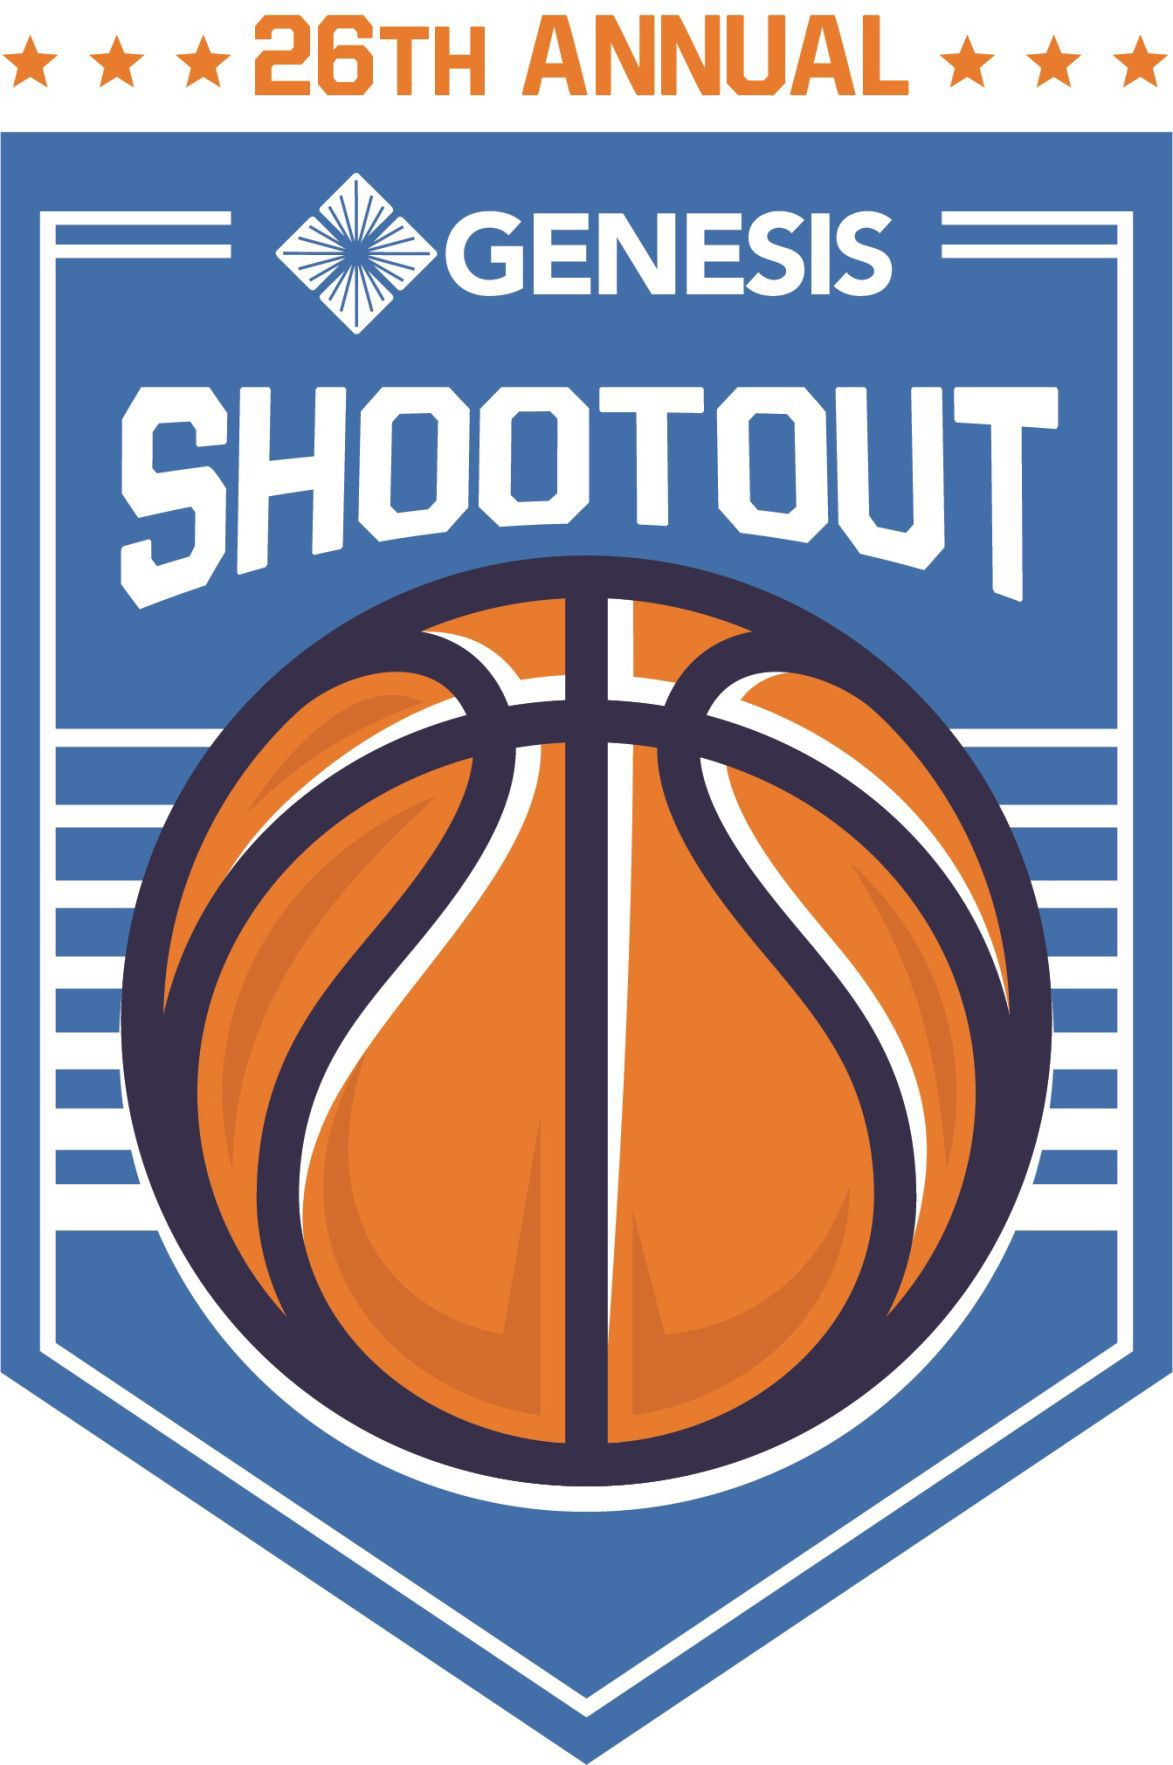 New genesis shootout Logo